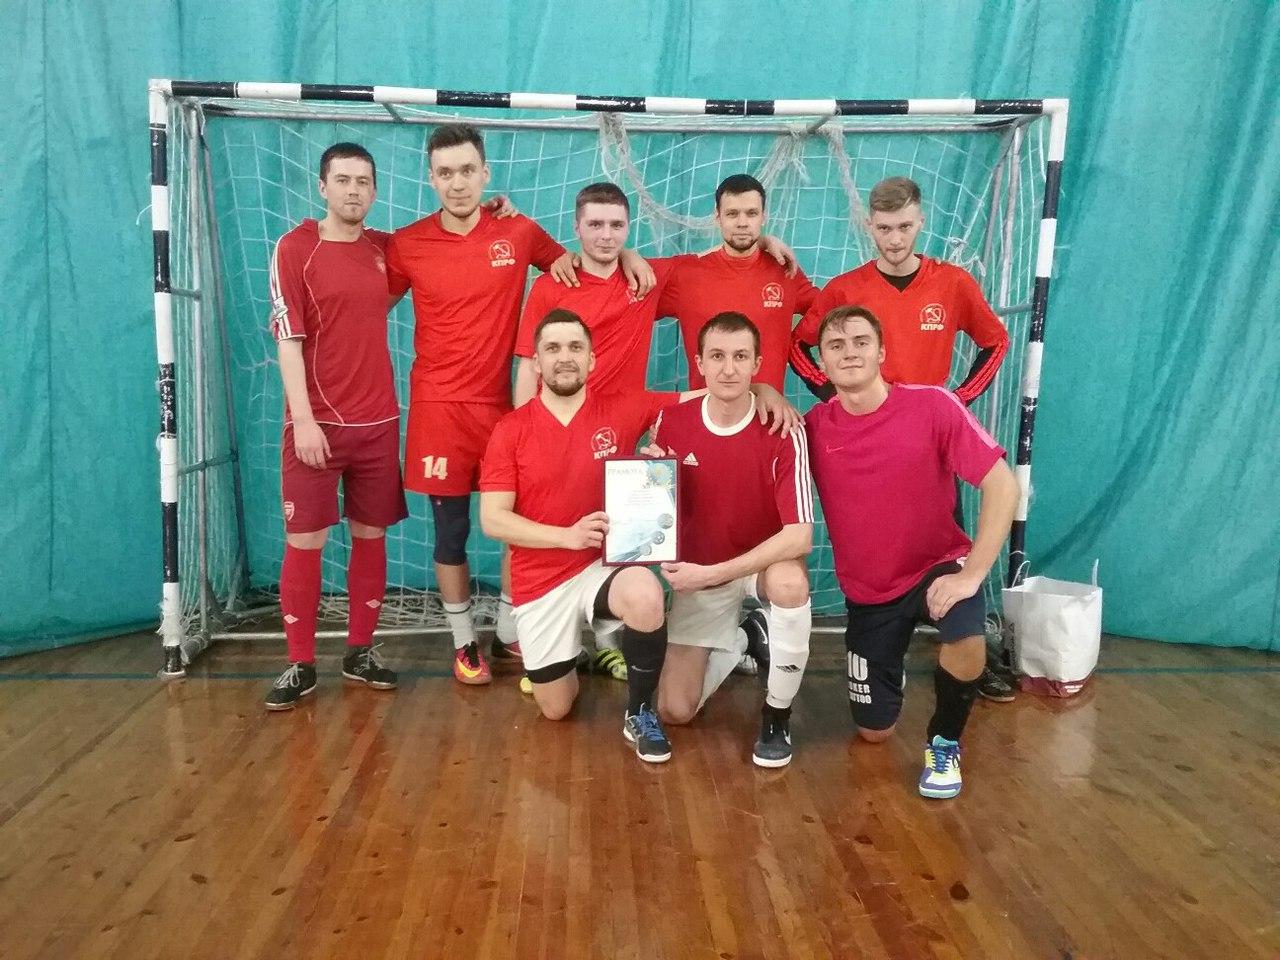 «Ленком» занял четвёртое место во второй лиге чемпионата Иркутска по мини-футболу